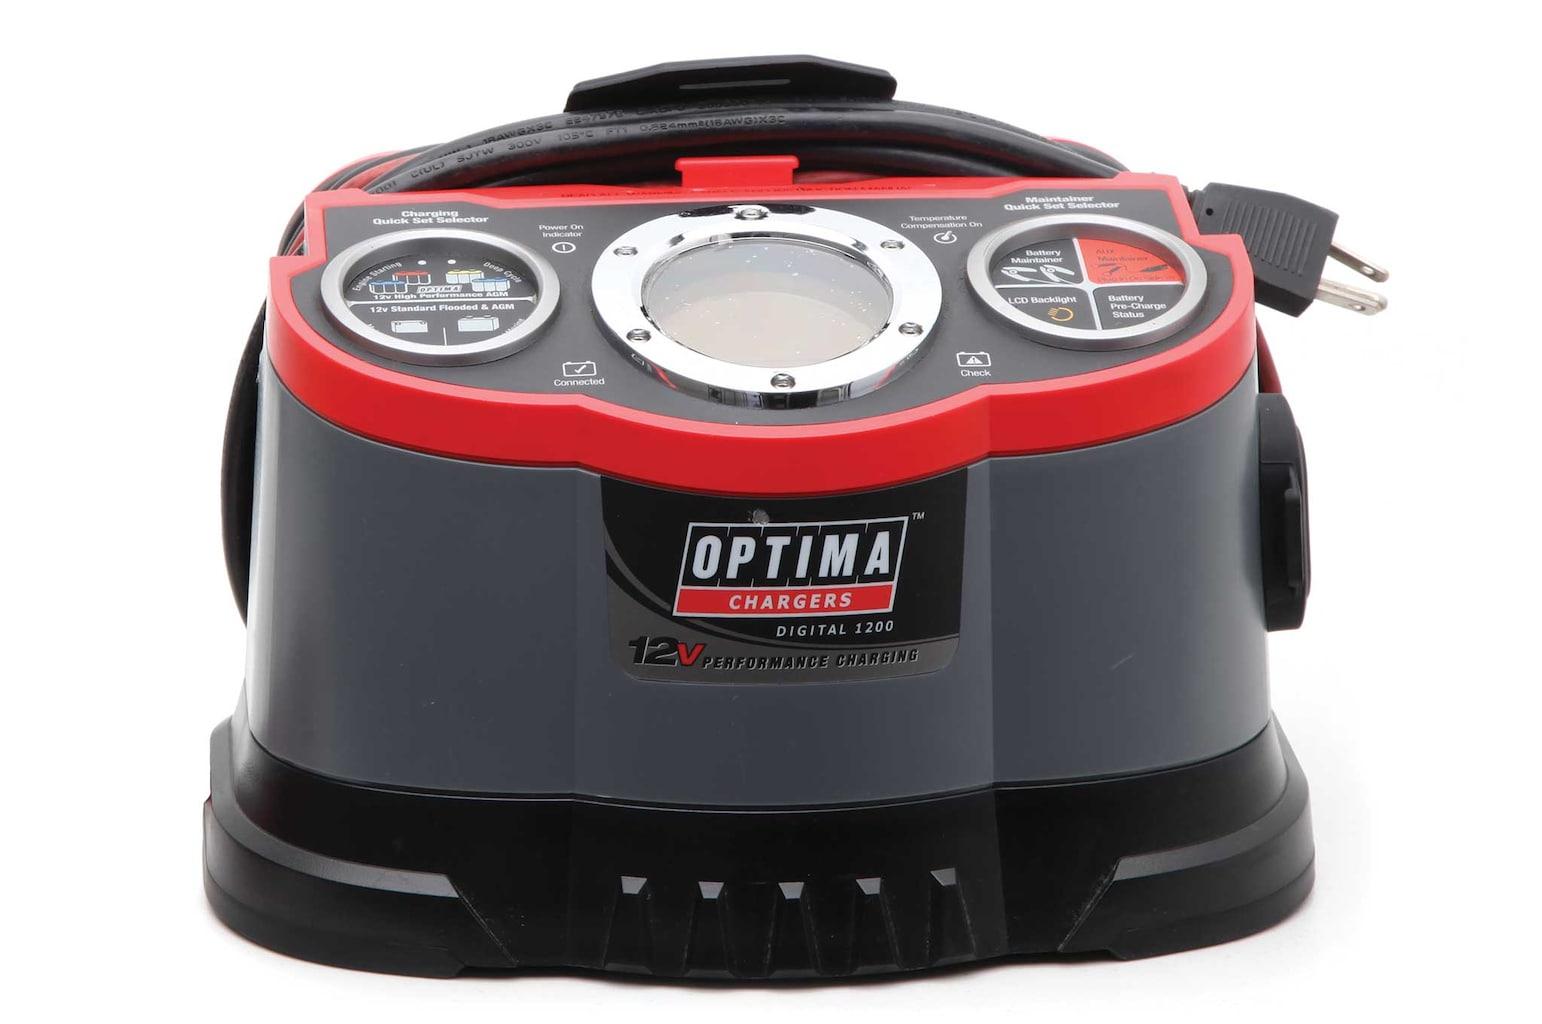 battery reviews optima digital 1200 charger 007